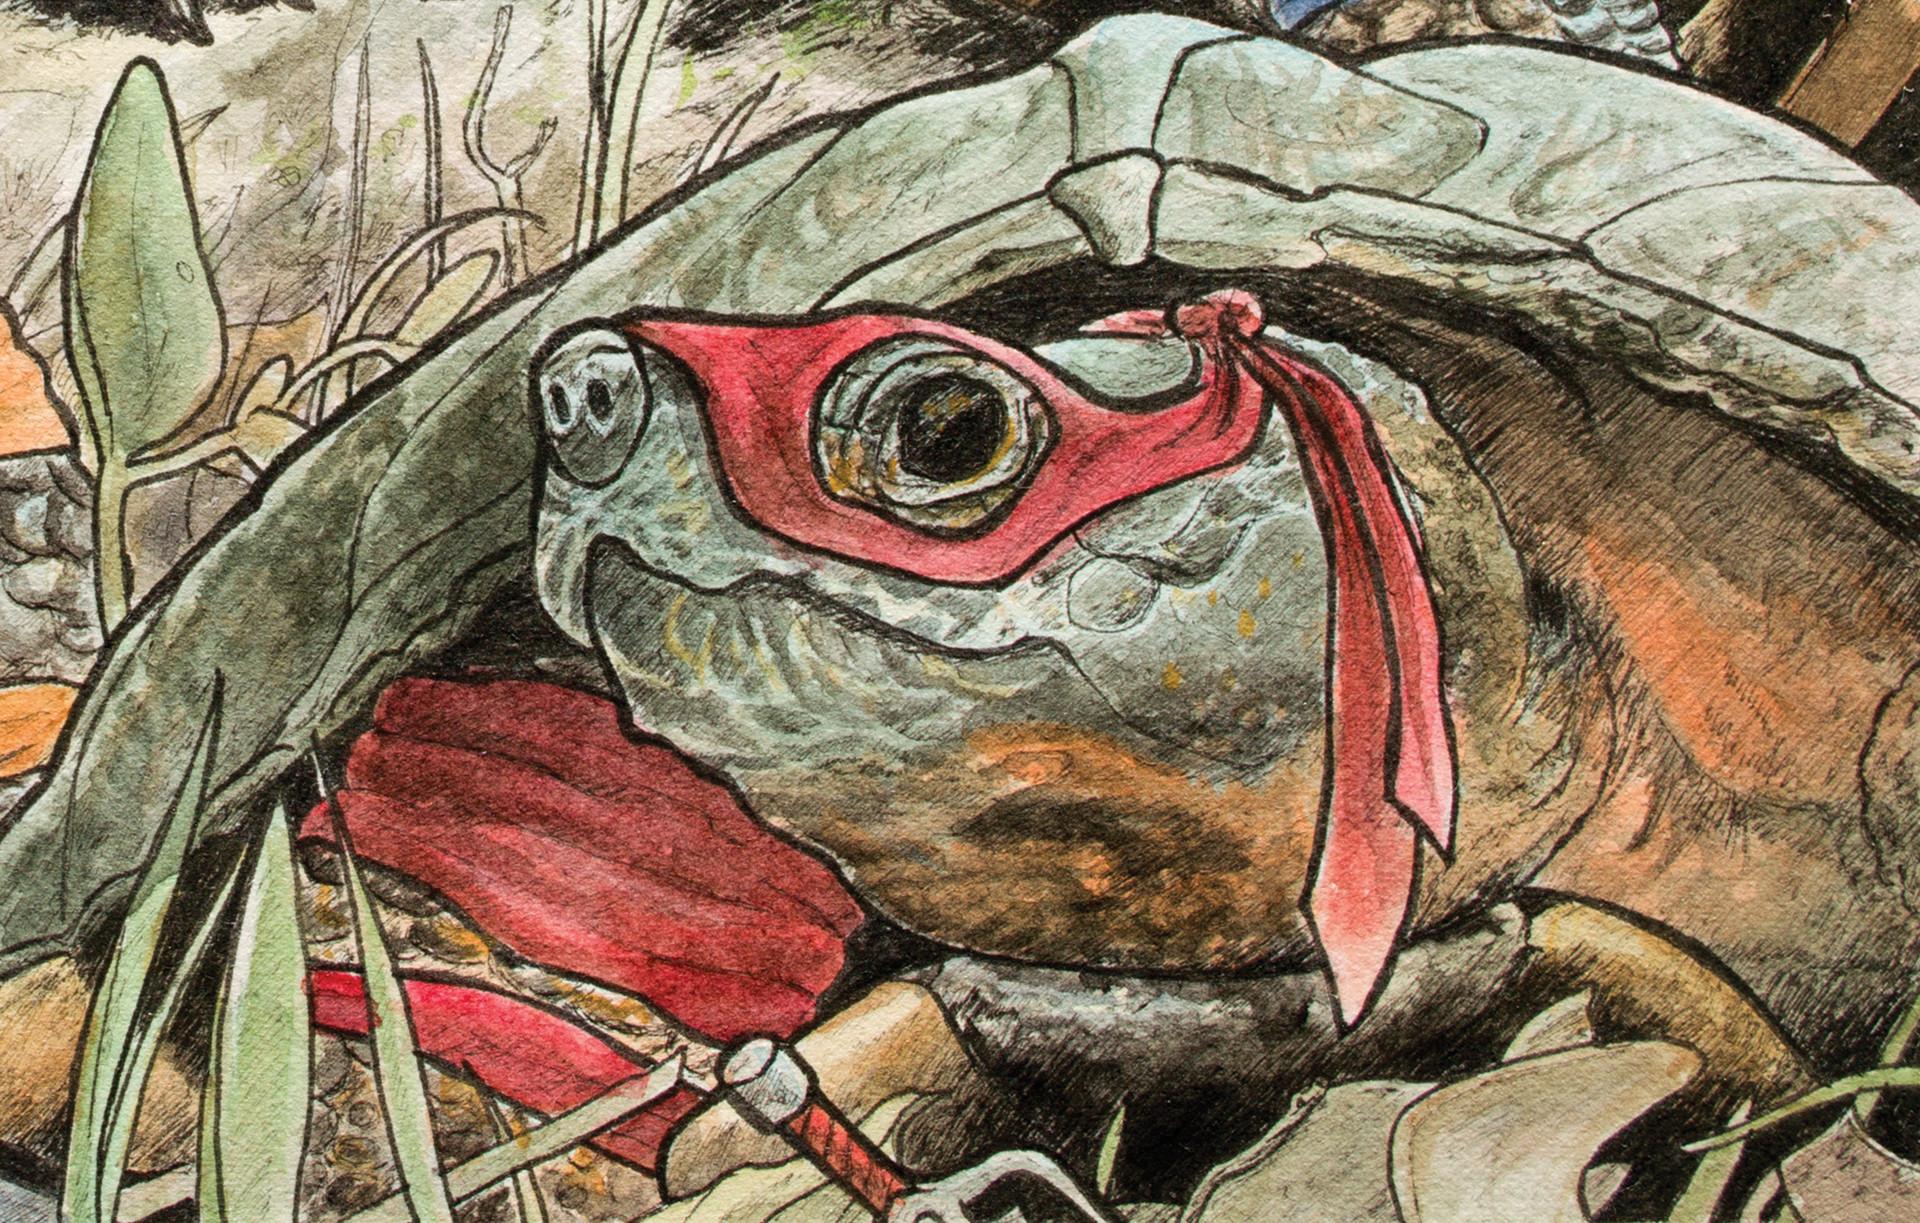 Graham moogk soulis moogk soulis turtles raf